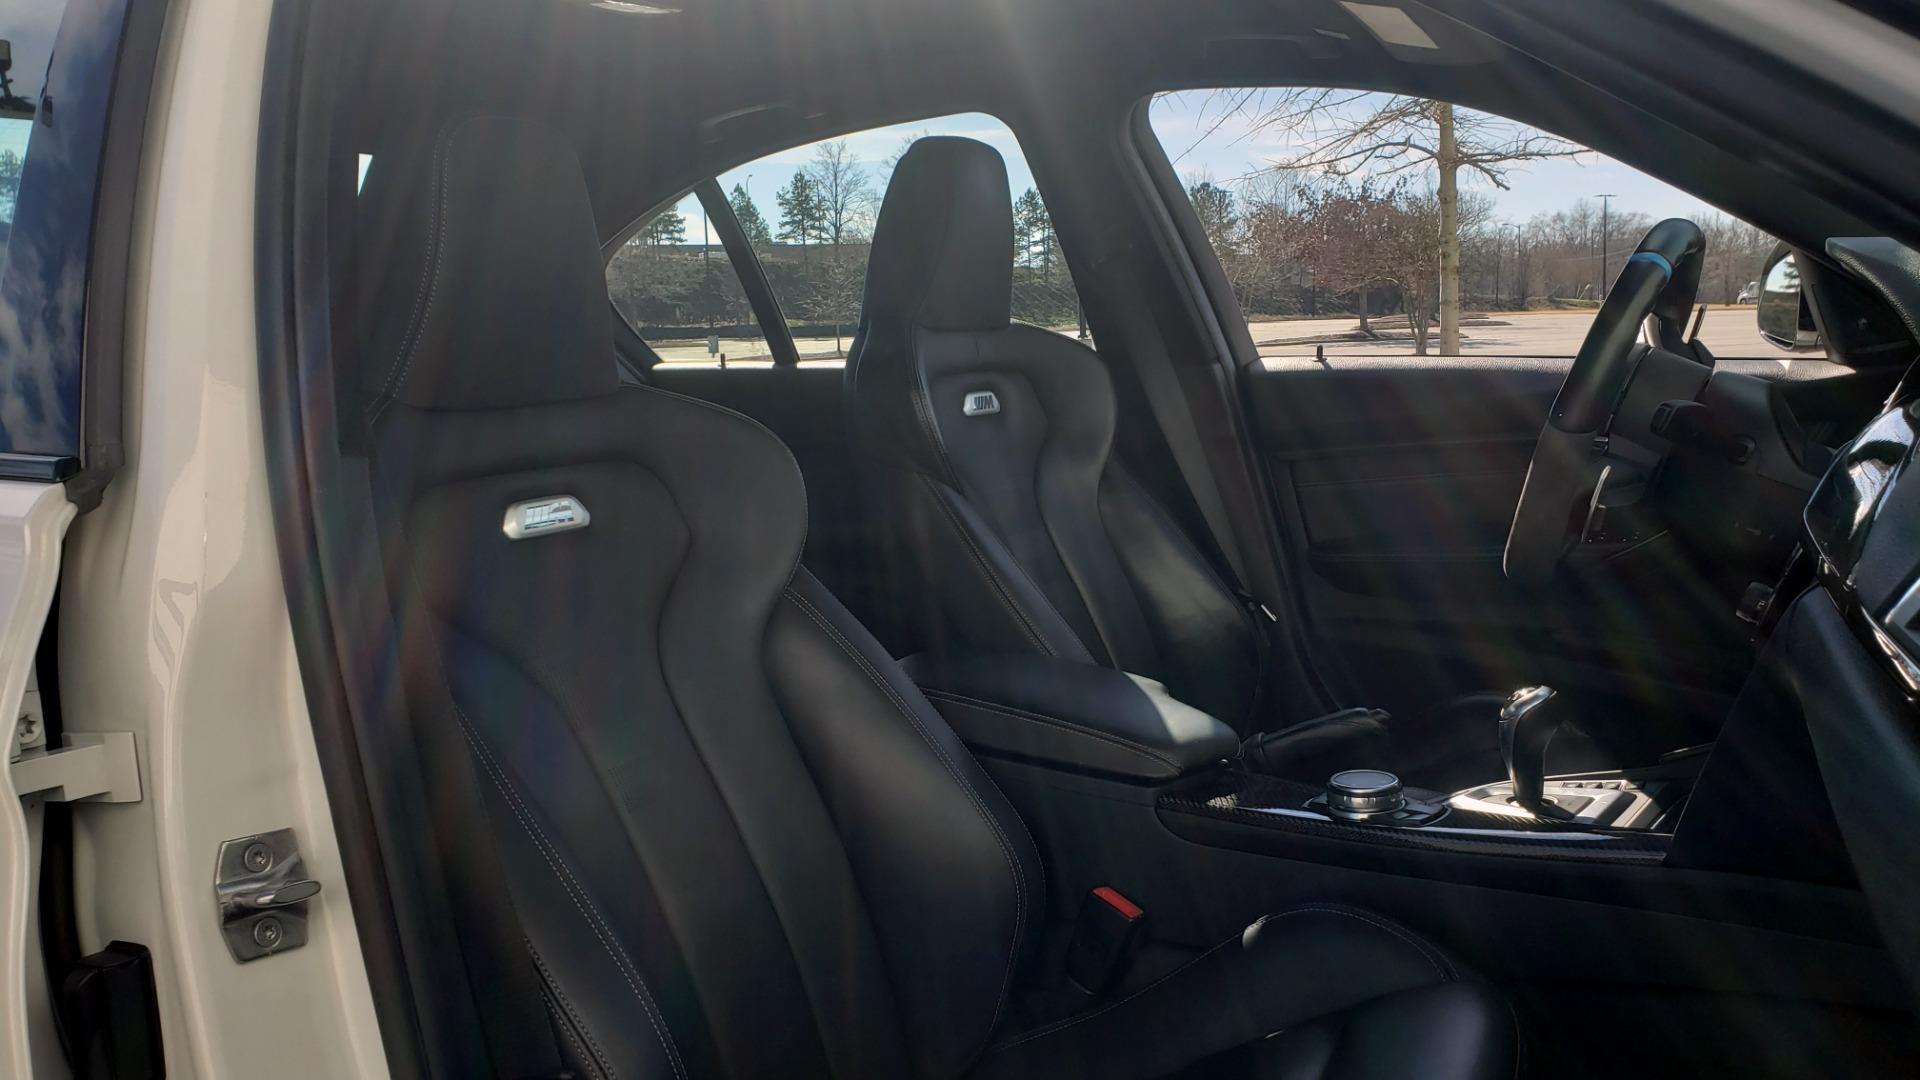 Used 2016 BMW M3 SEDAN / EXECUTIVE PKG / M-SUSPENSION / HARMAN/KARDON SOUND for sale Sold at Formula Imports in Charlotte NC 28227 68